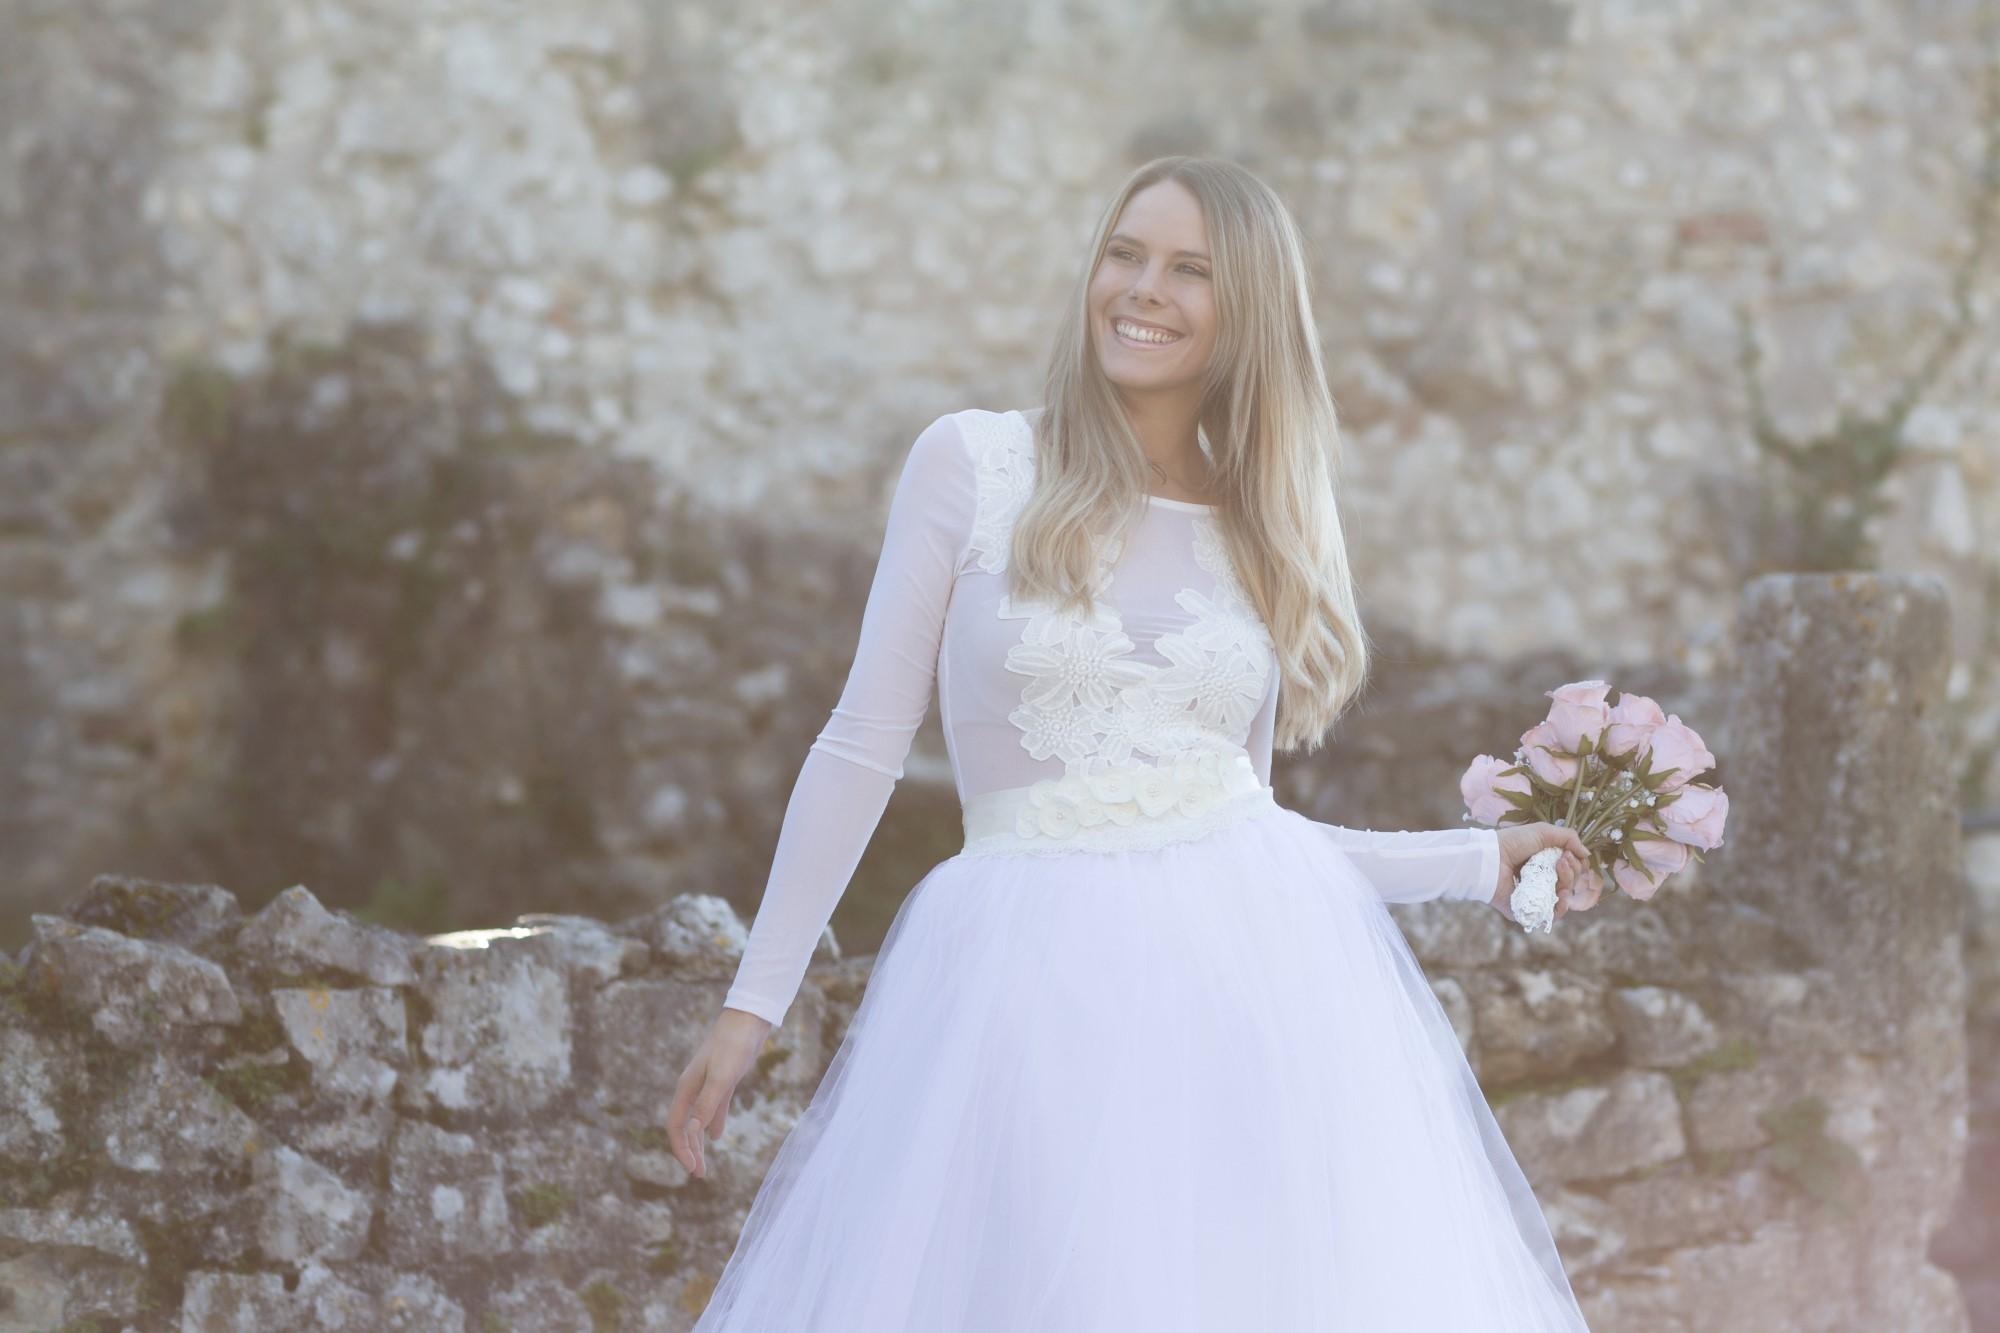 Die lachende Braut Tanja beim Fotoshooting